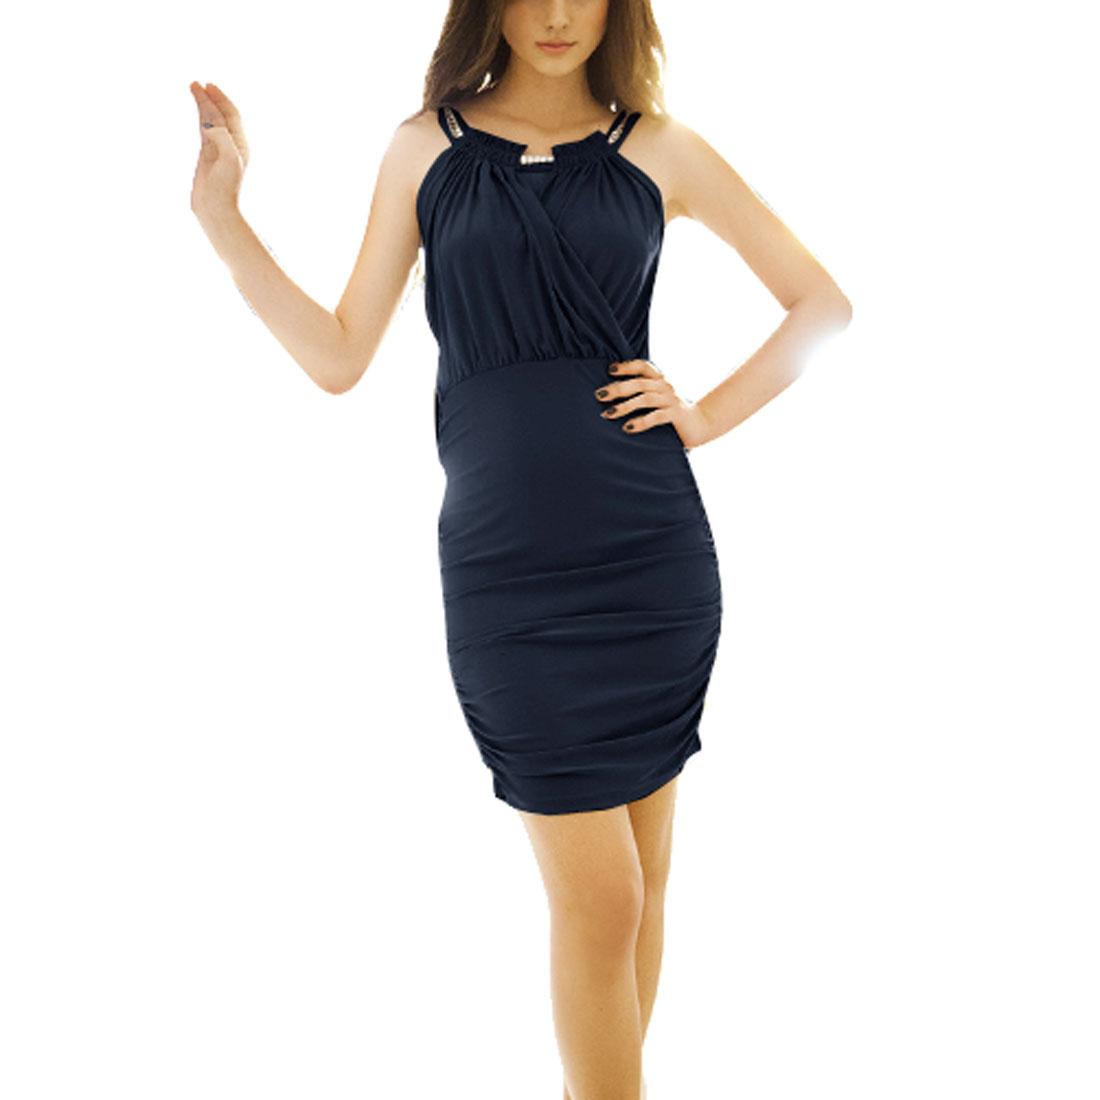 Plastic Crystals Detail Round Collar Mini Dress Steel Blue XS for Ladies